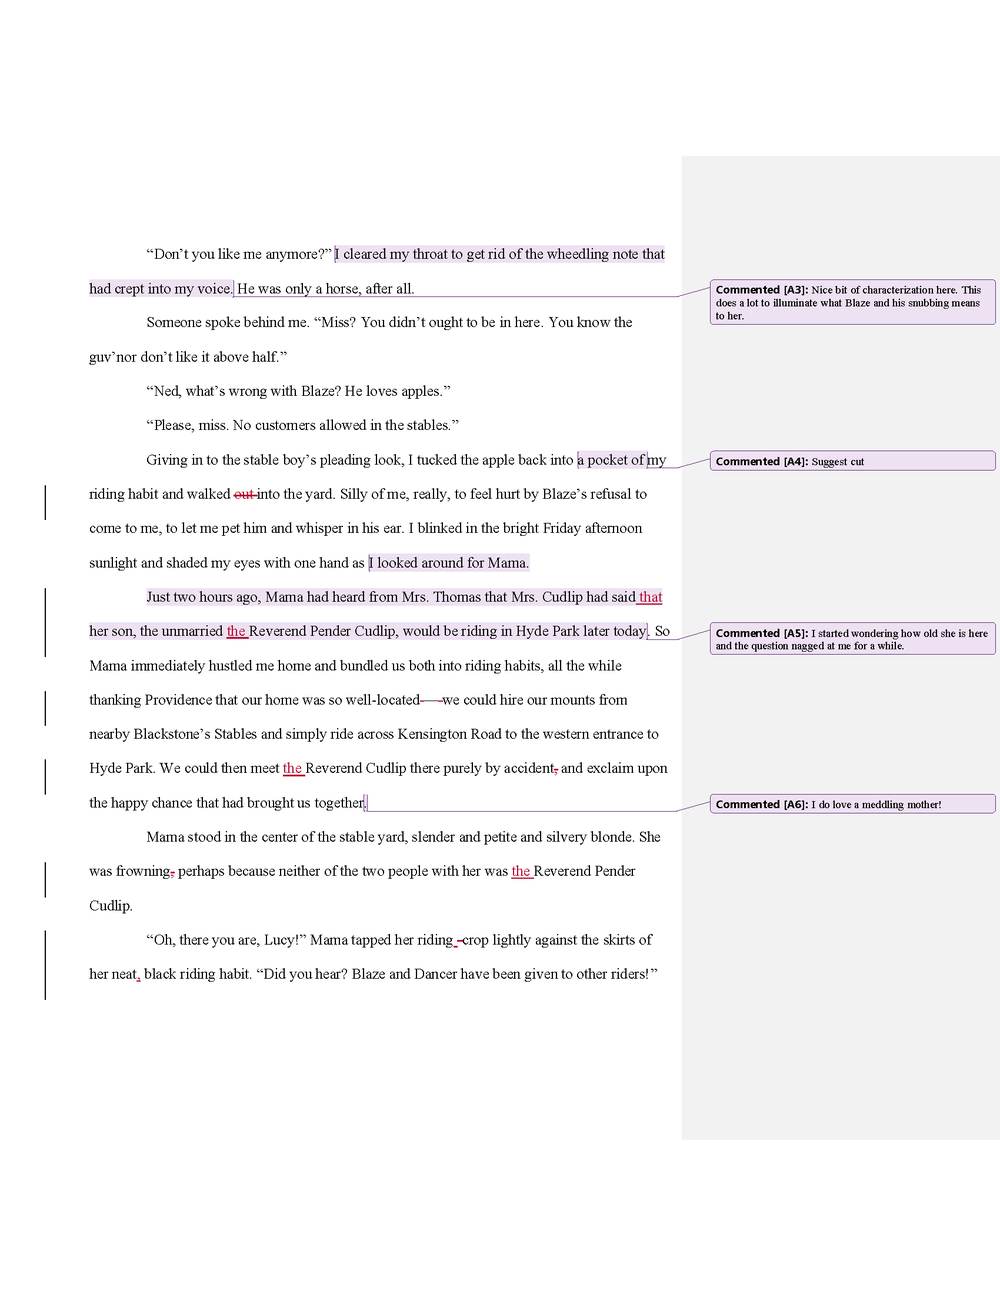 56-MysteryatBlackstoneStables-1_Page_2.png